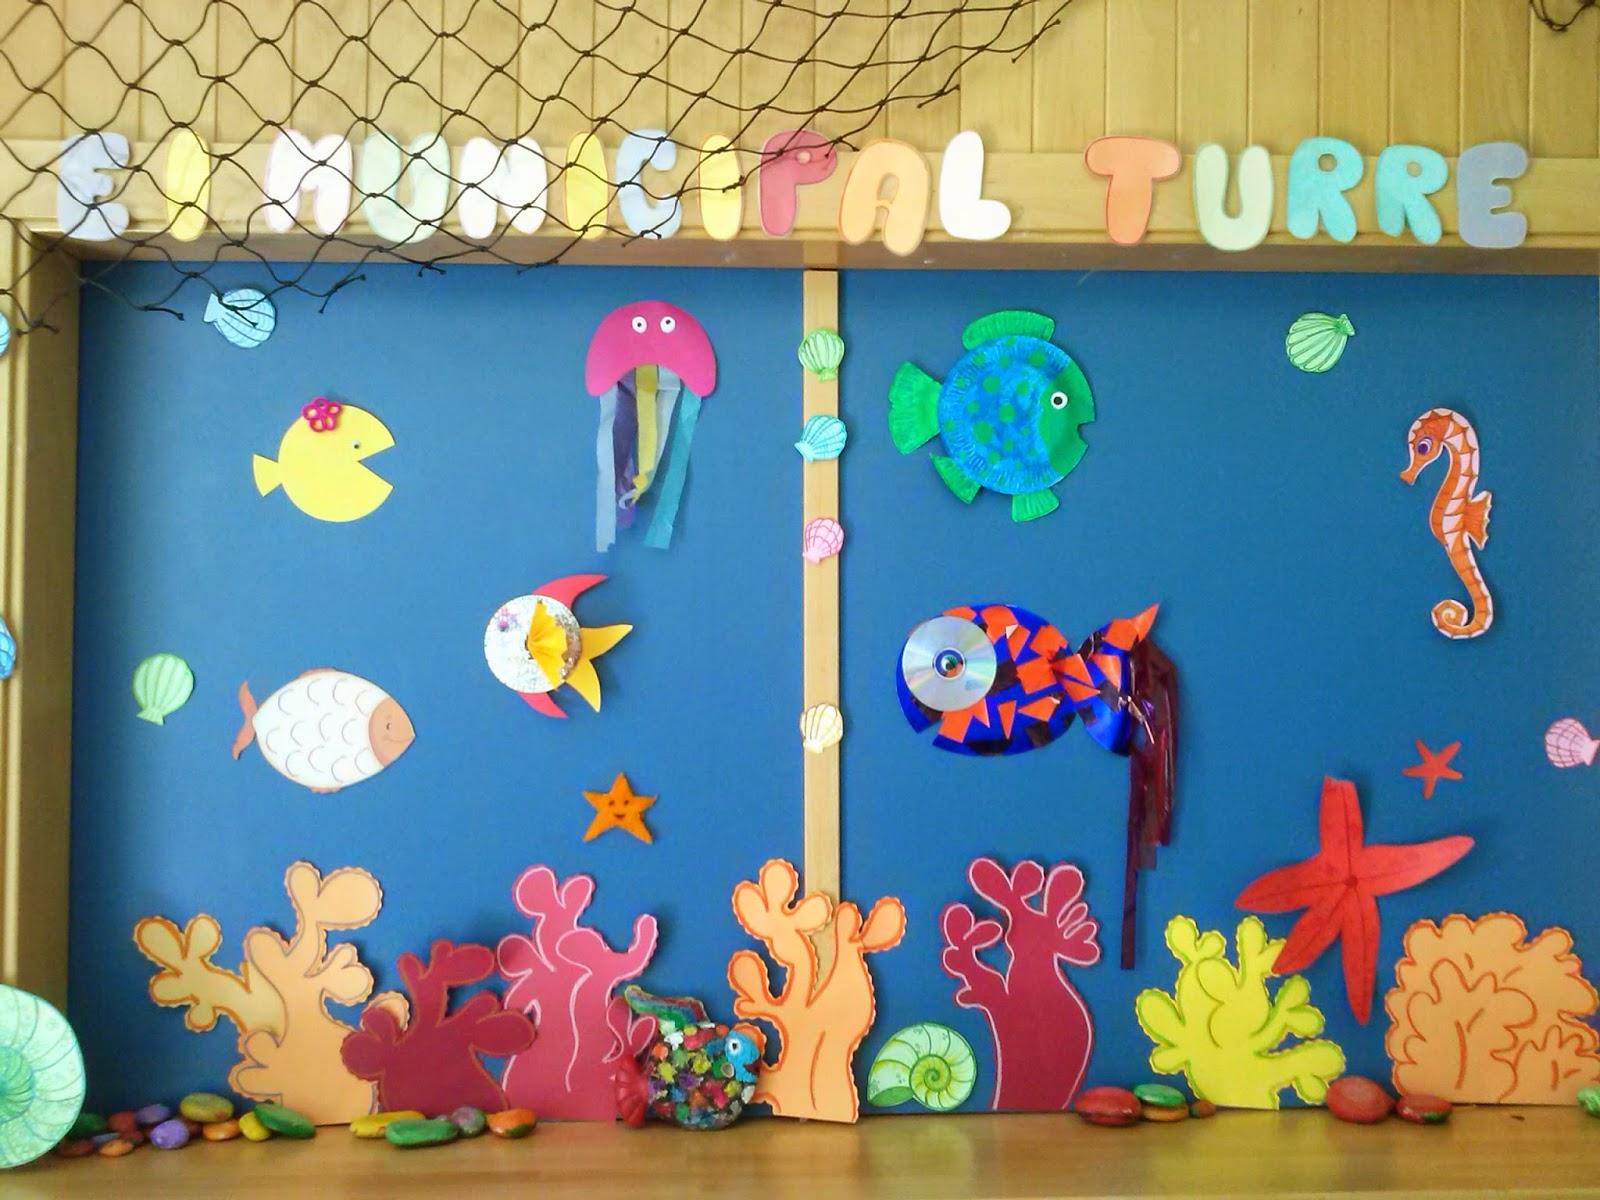 Escuela infantil turre julio 2014 for Escuela de decoracion